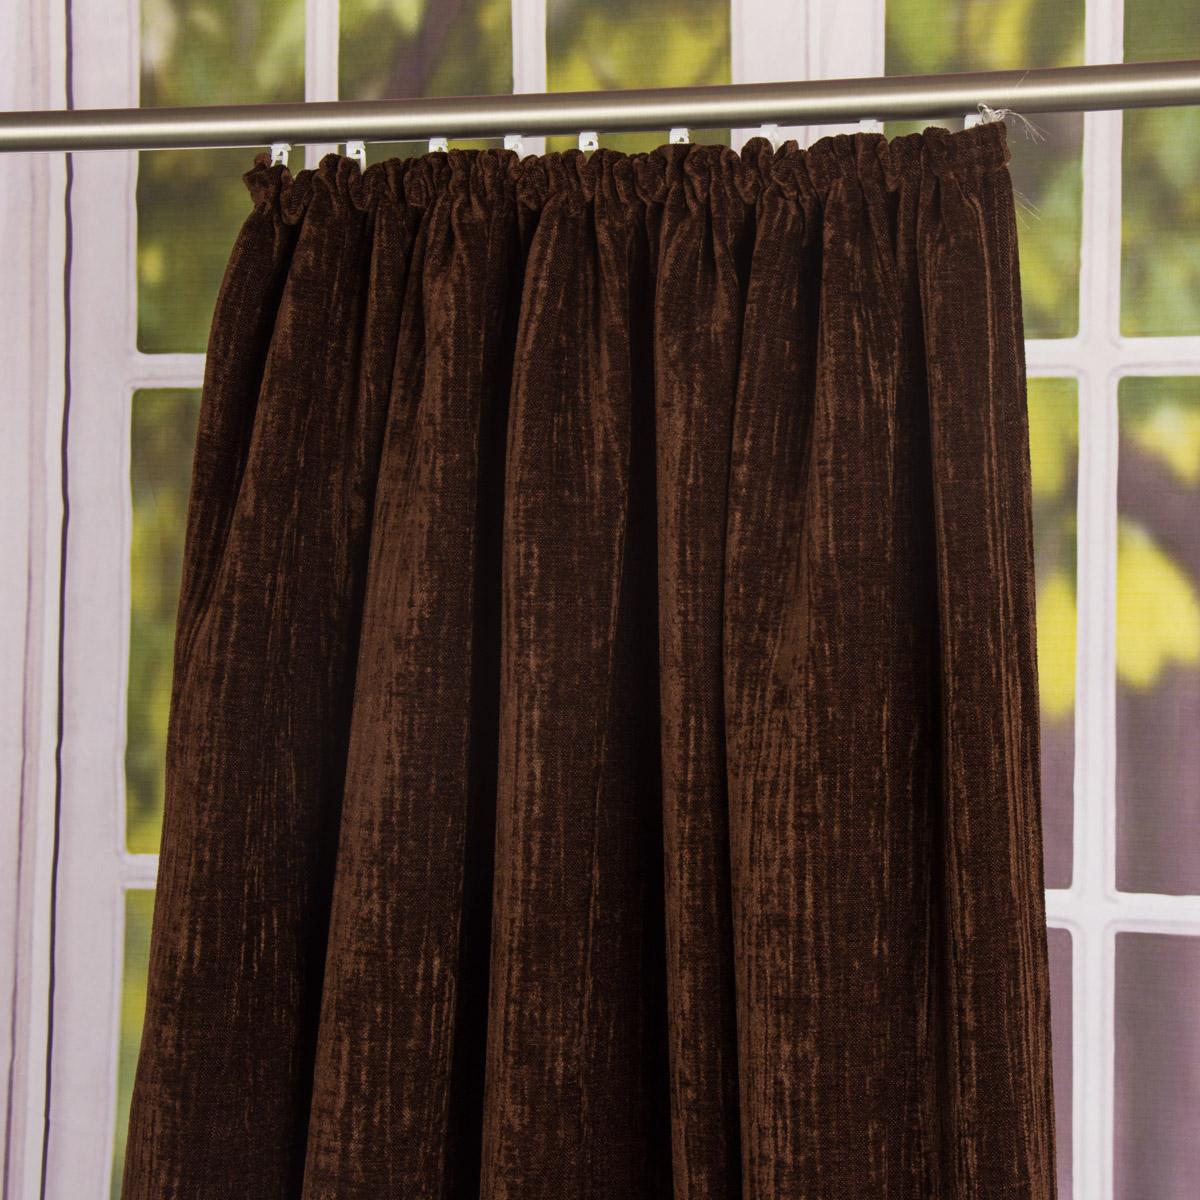 thermo chenille fertigvorhang k lteschutz schallschutz verdunkelung braun 145x245cm gardinen. Black Bedroom Furniture Sets. Home Design Ideas